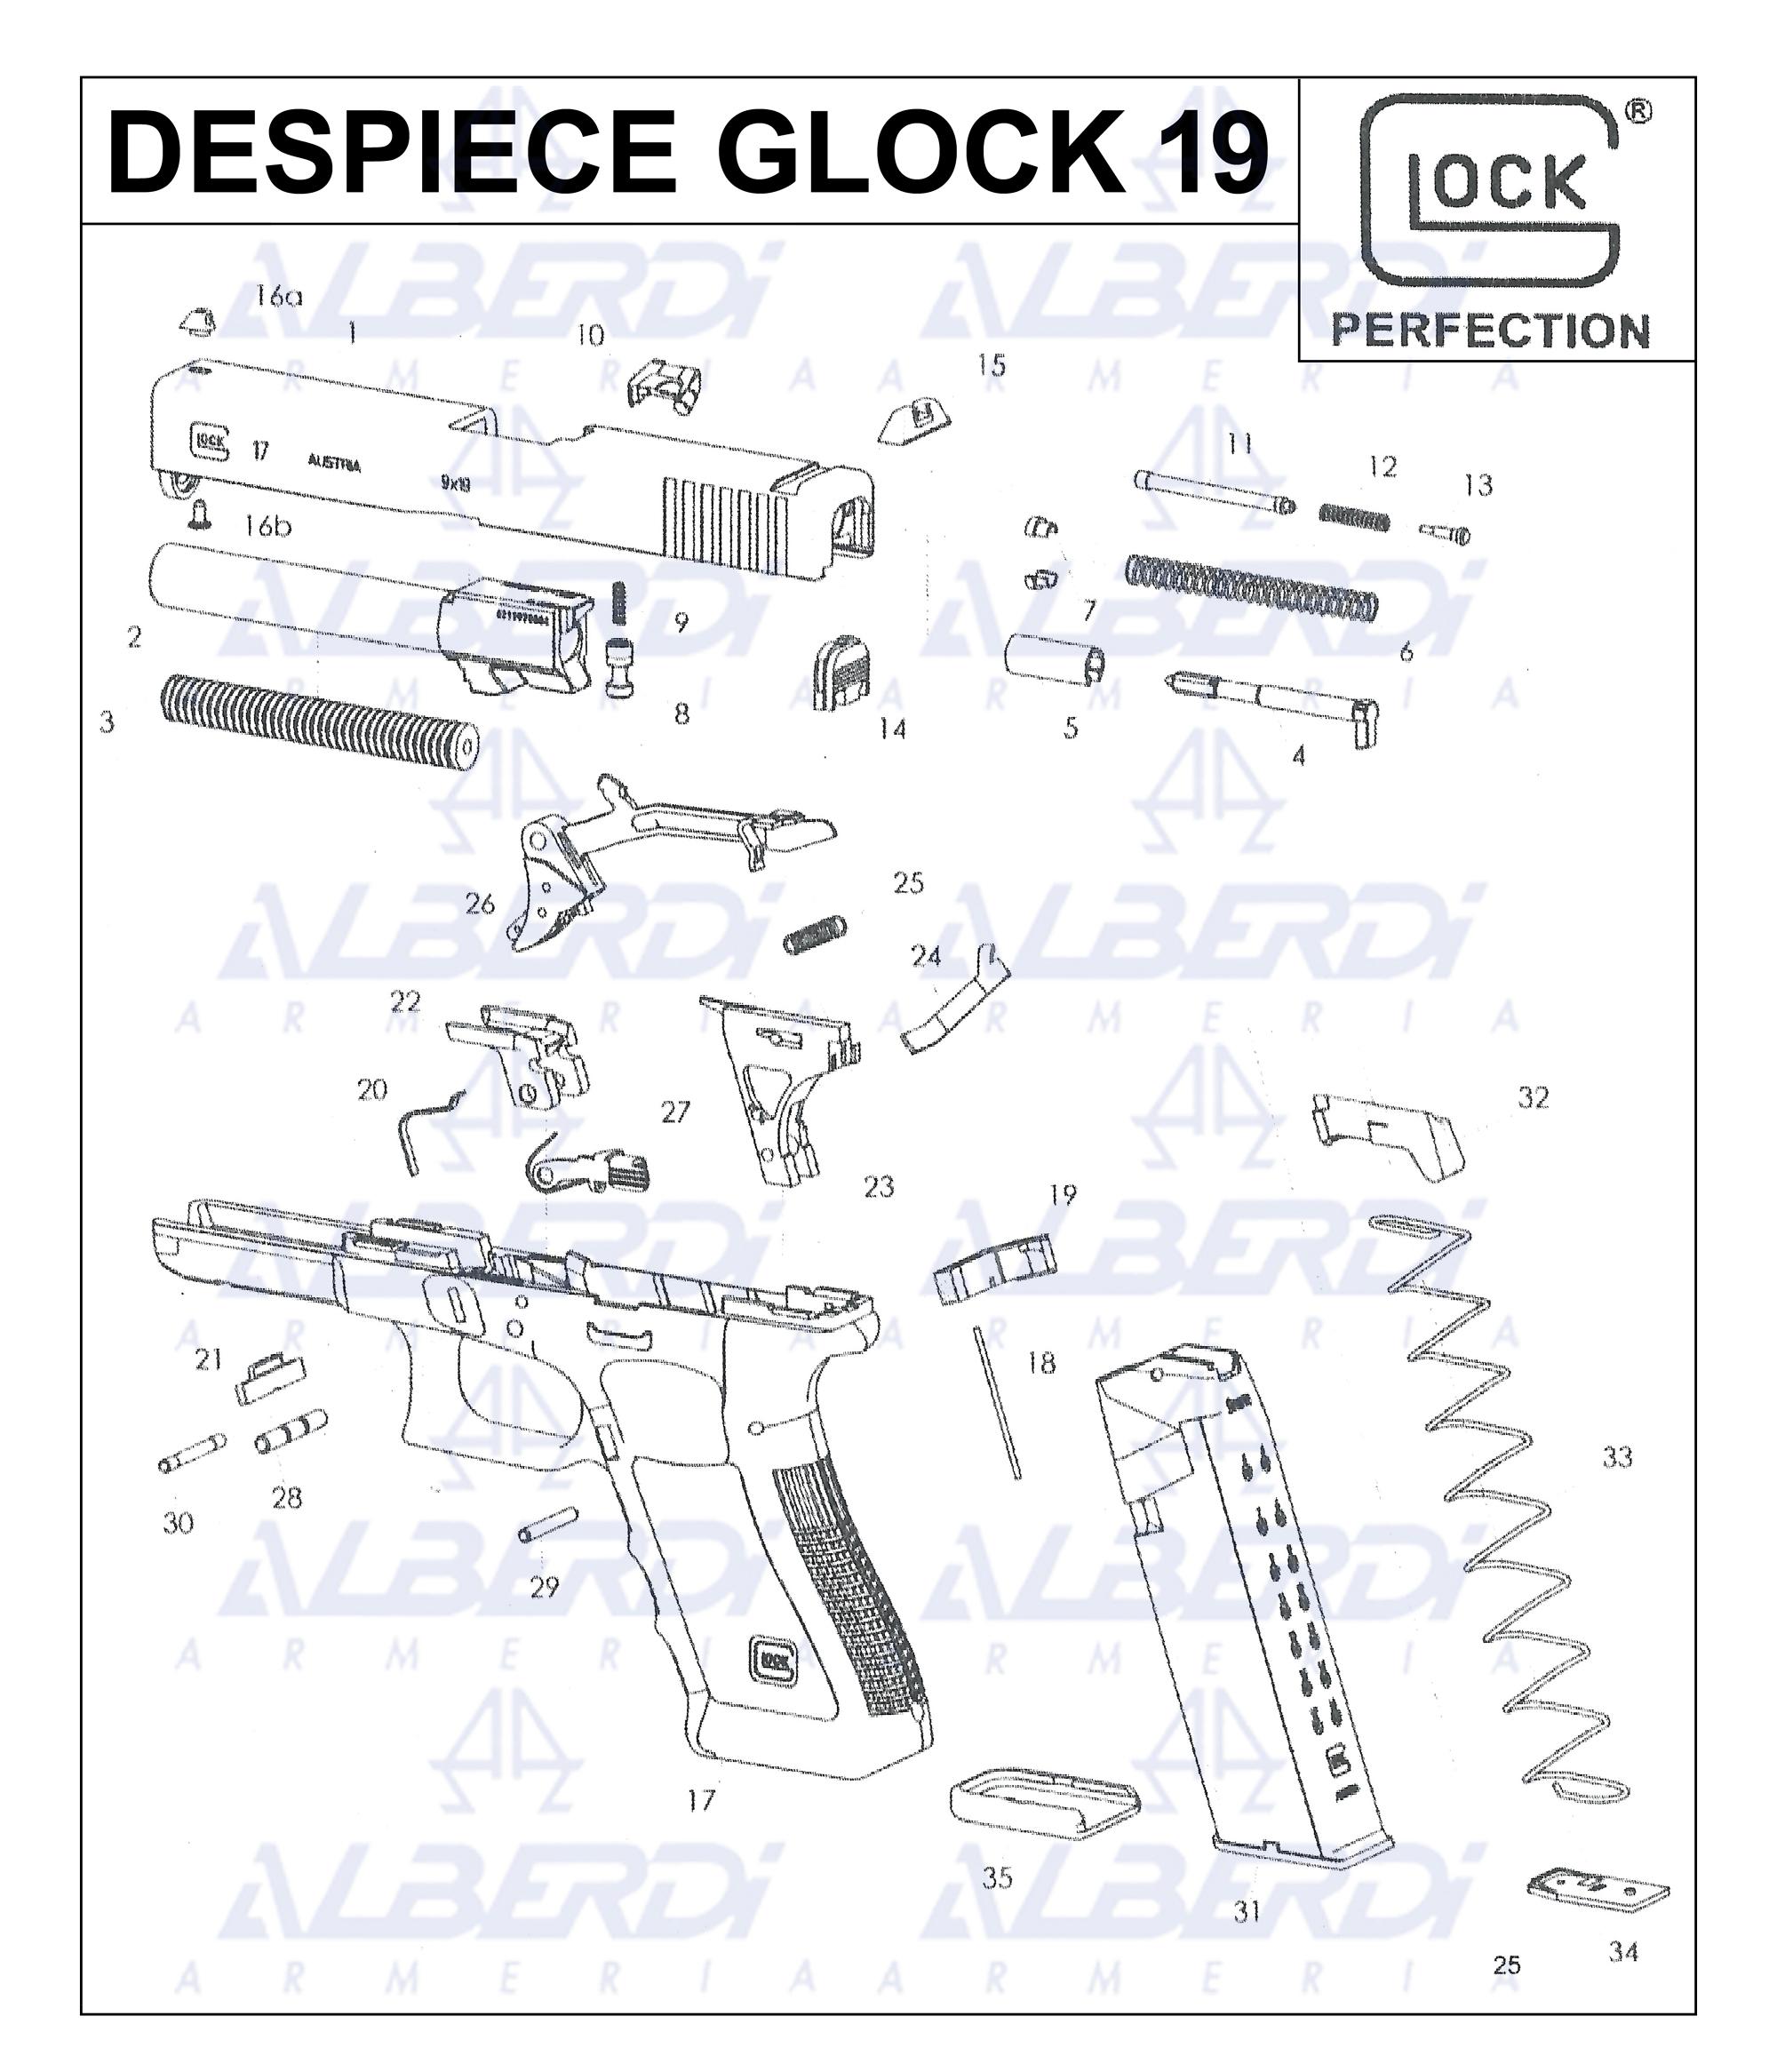 Glock modelo 19 001 Agua